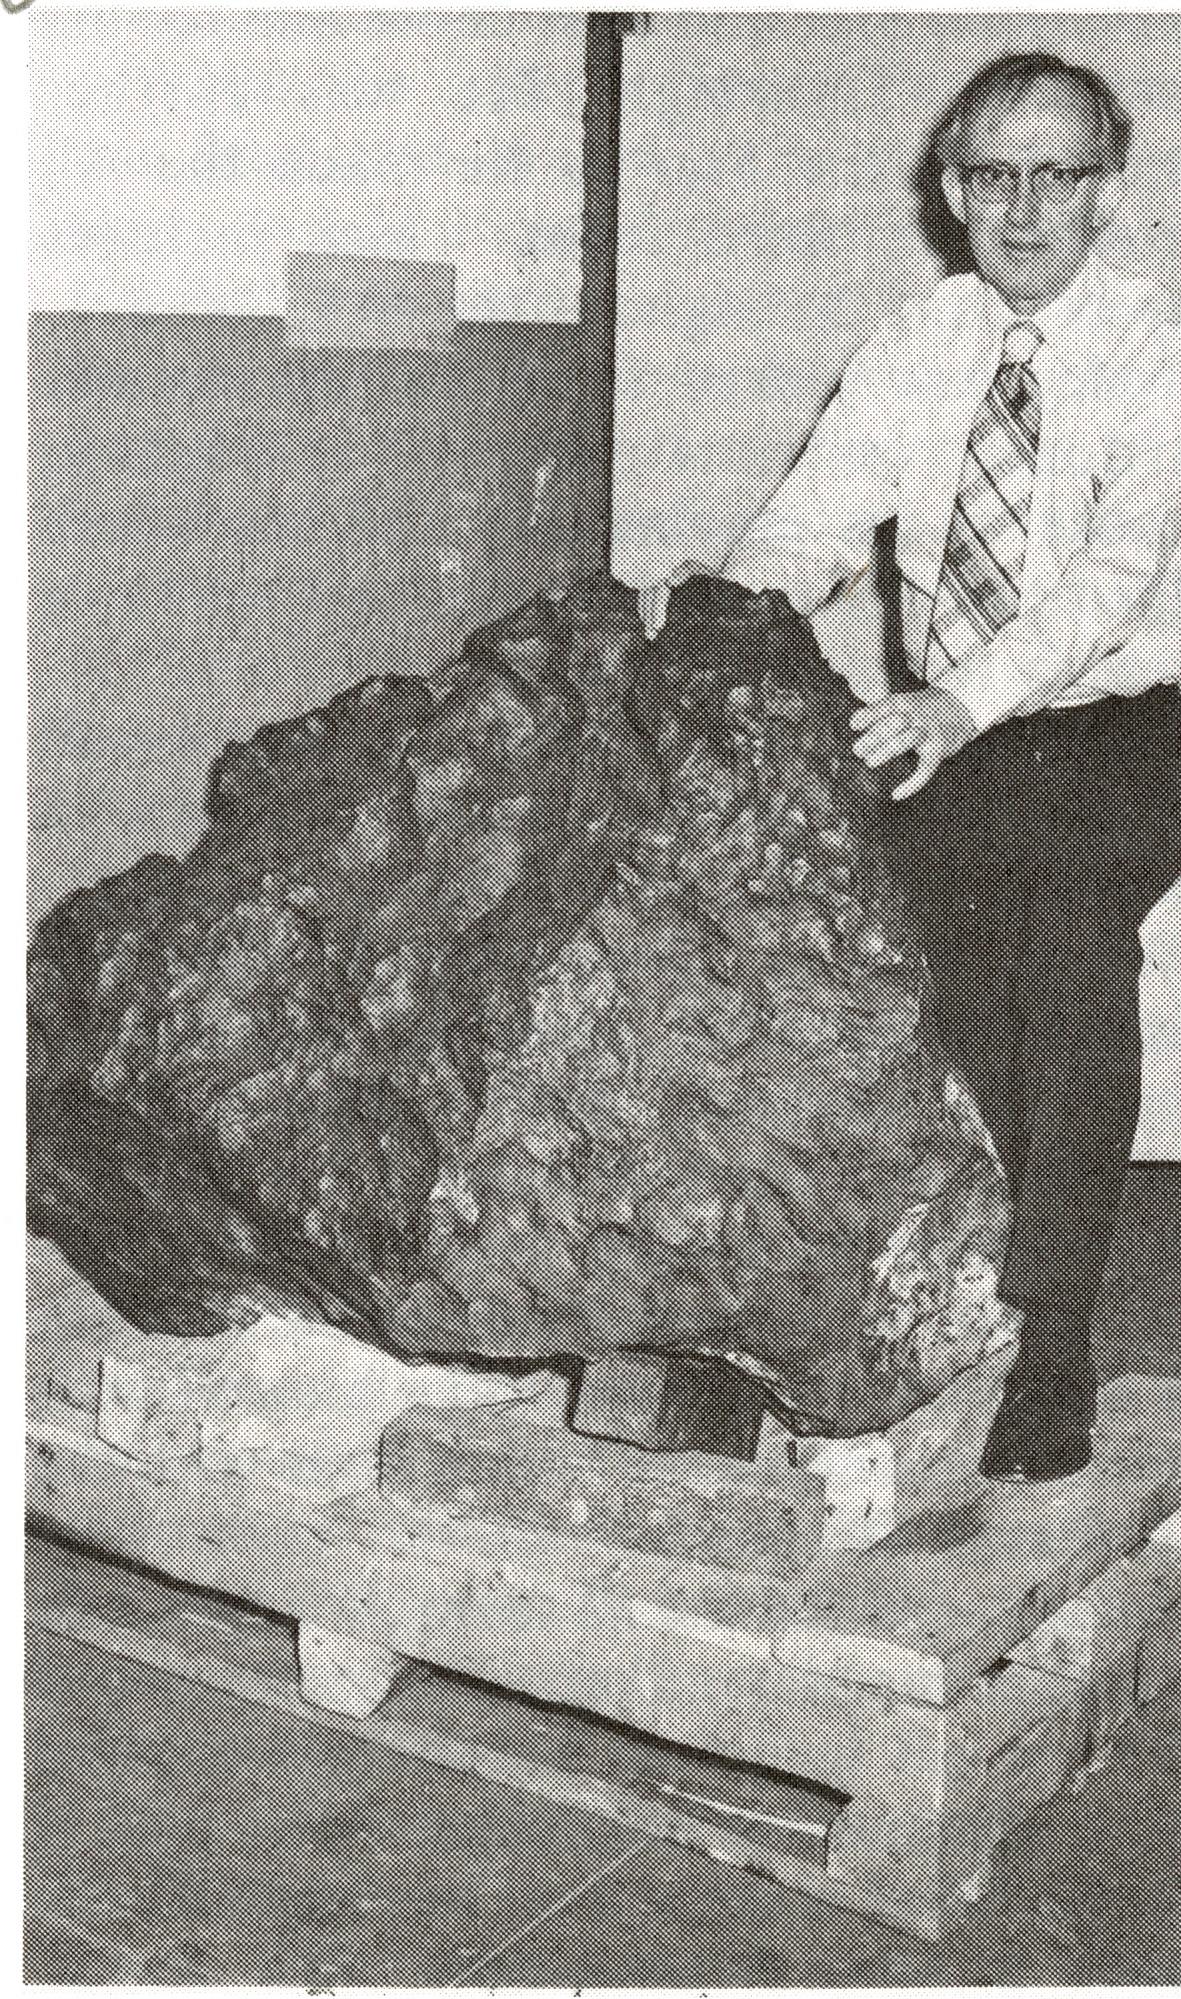 Curator Roy S. Clarke with Meteorite